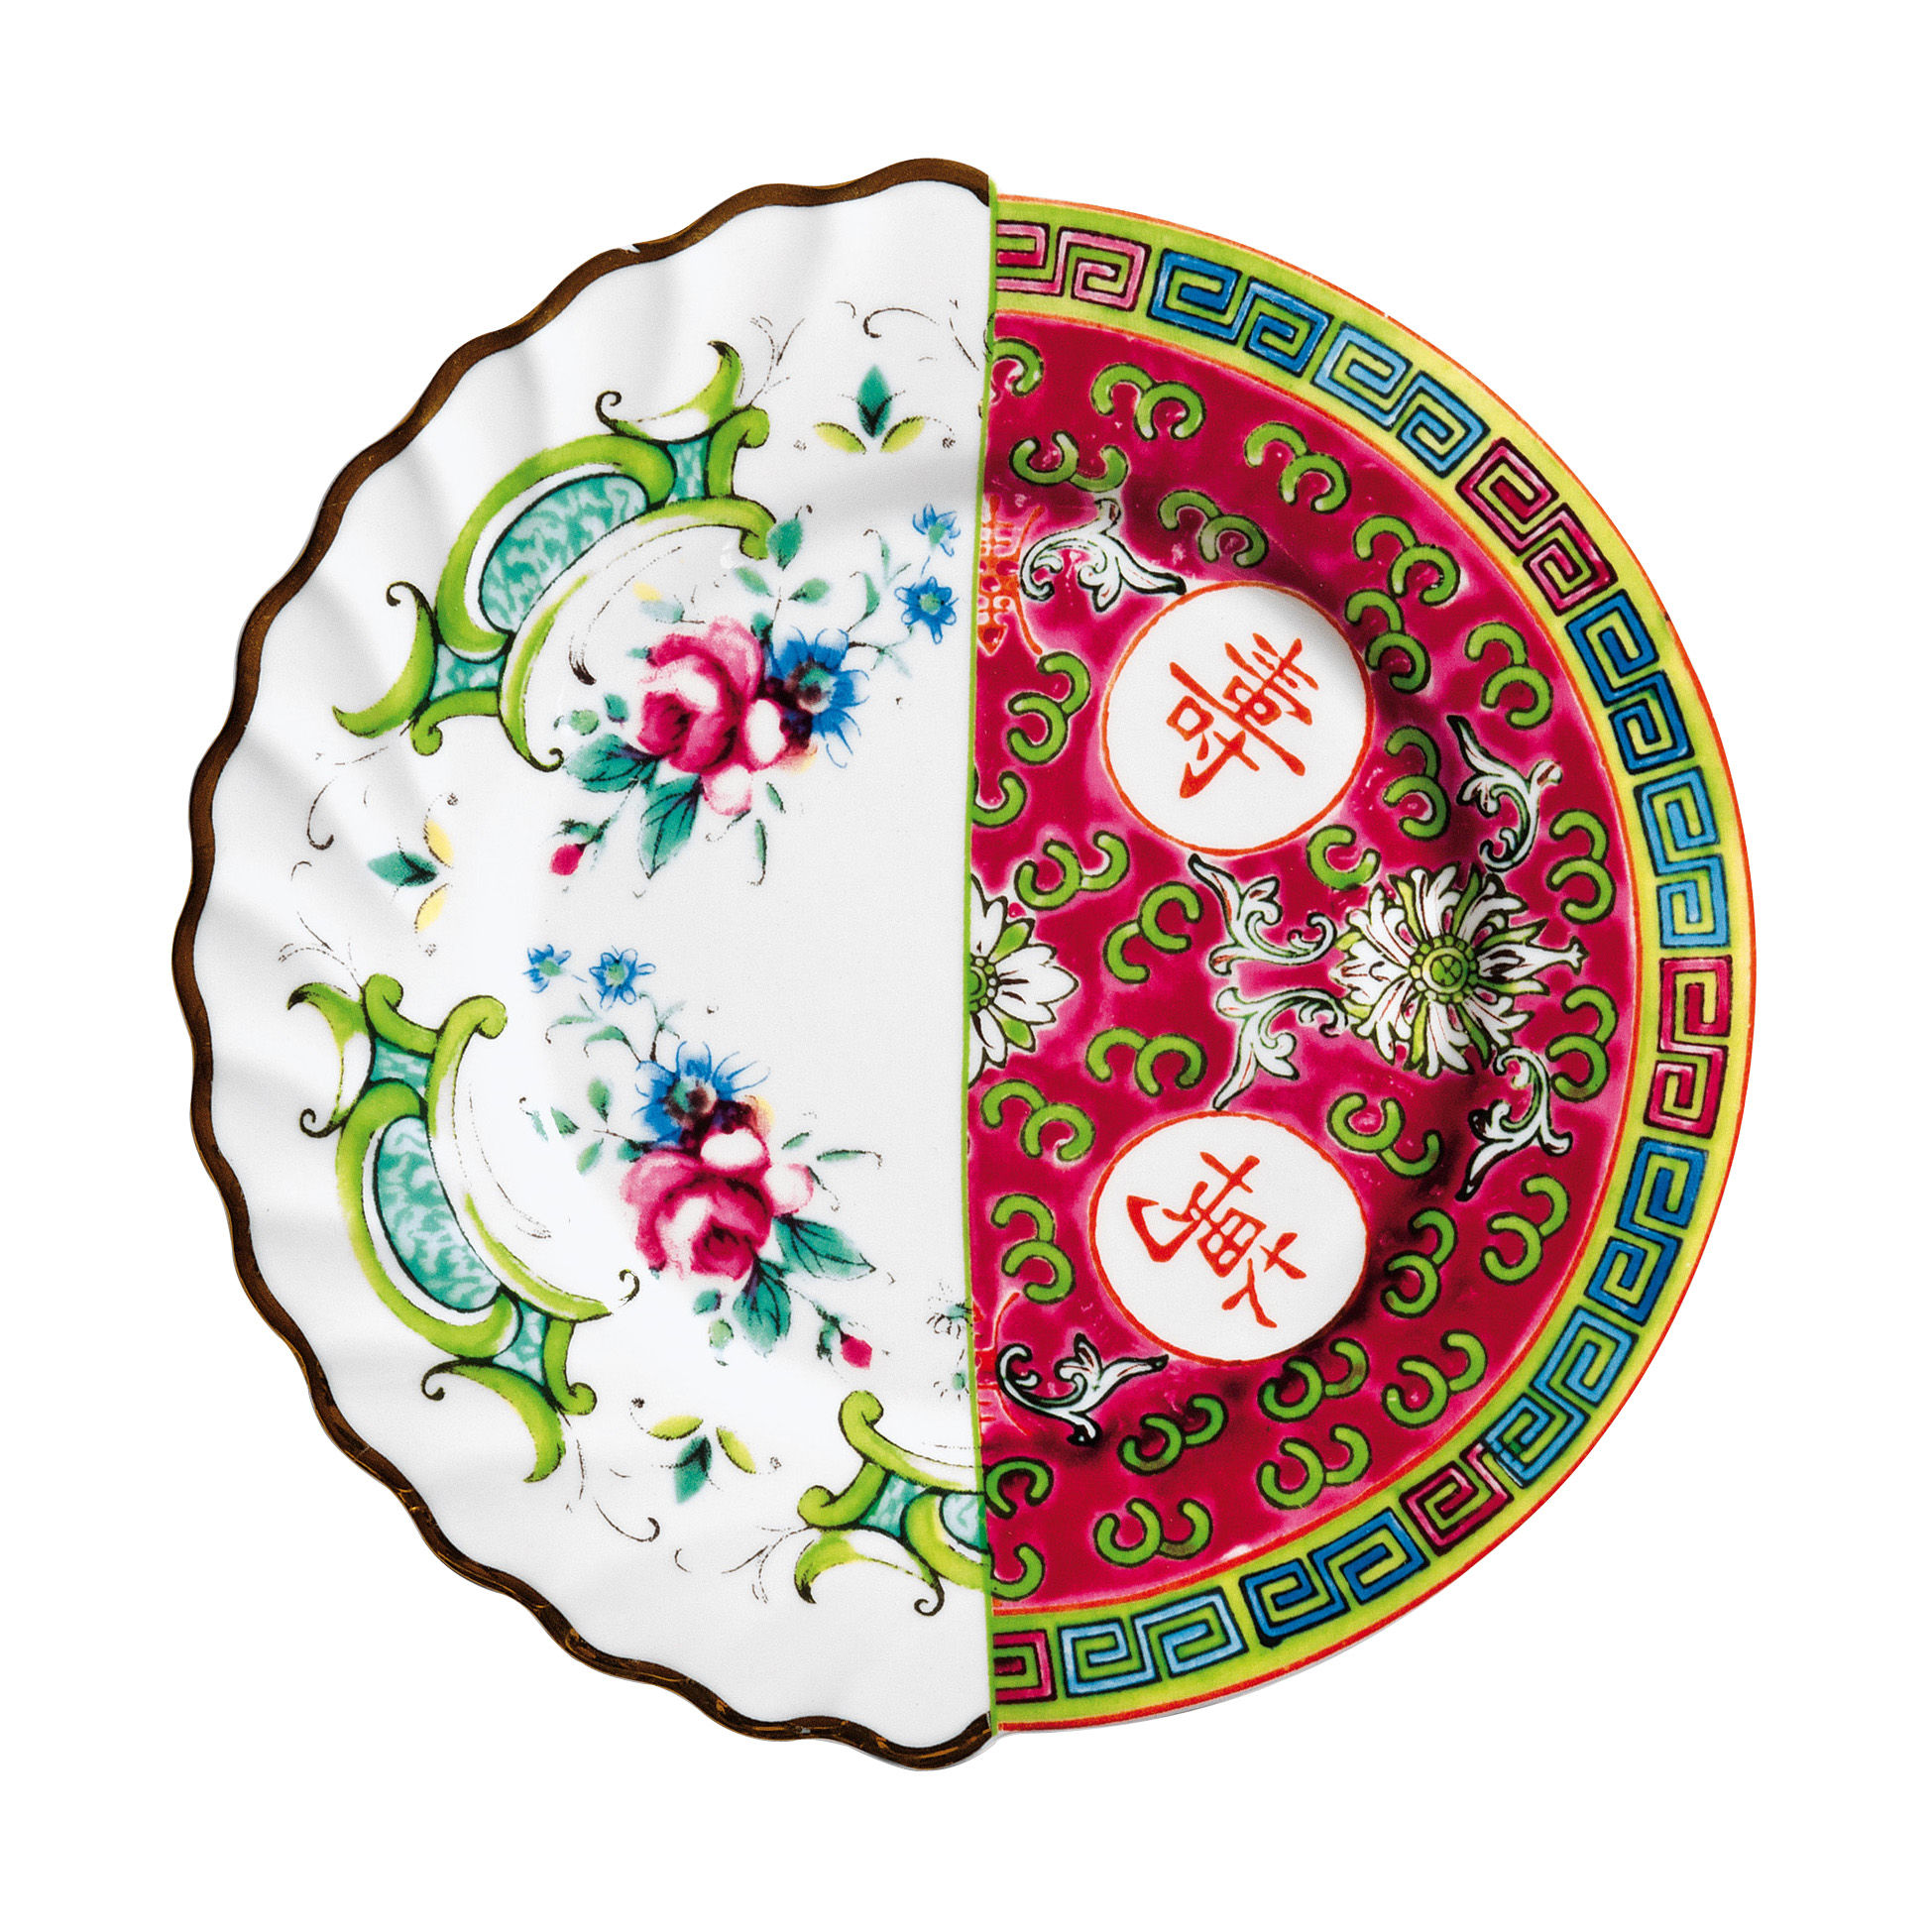 Tischkultur - Teller - Hybrid Eudossia Dessertteller Ø 20 cm - Seletti - Eudossia - Porzellan